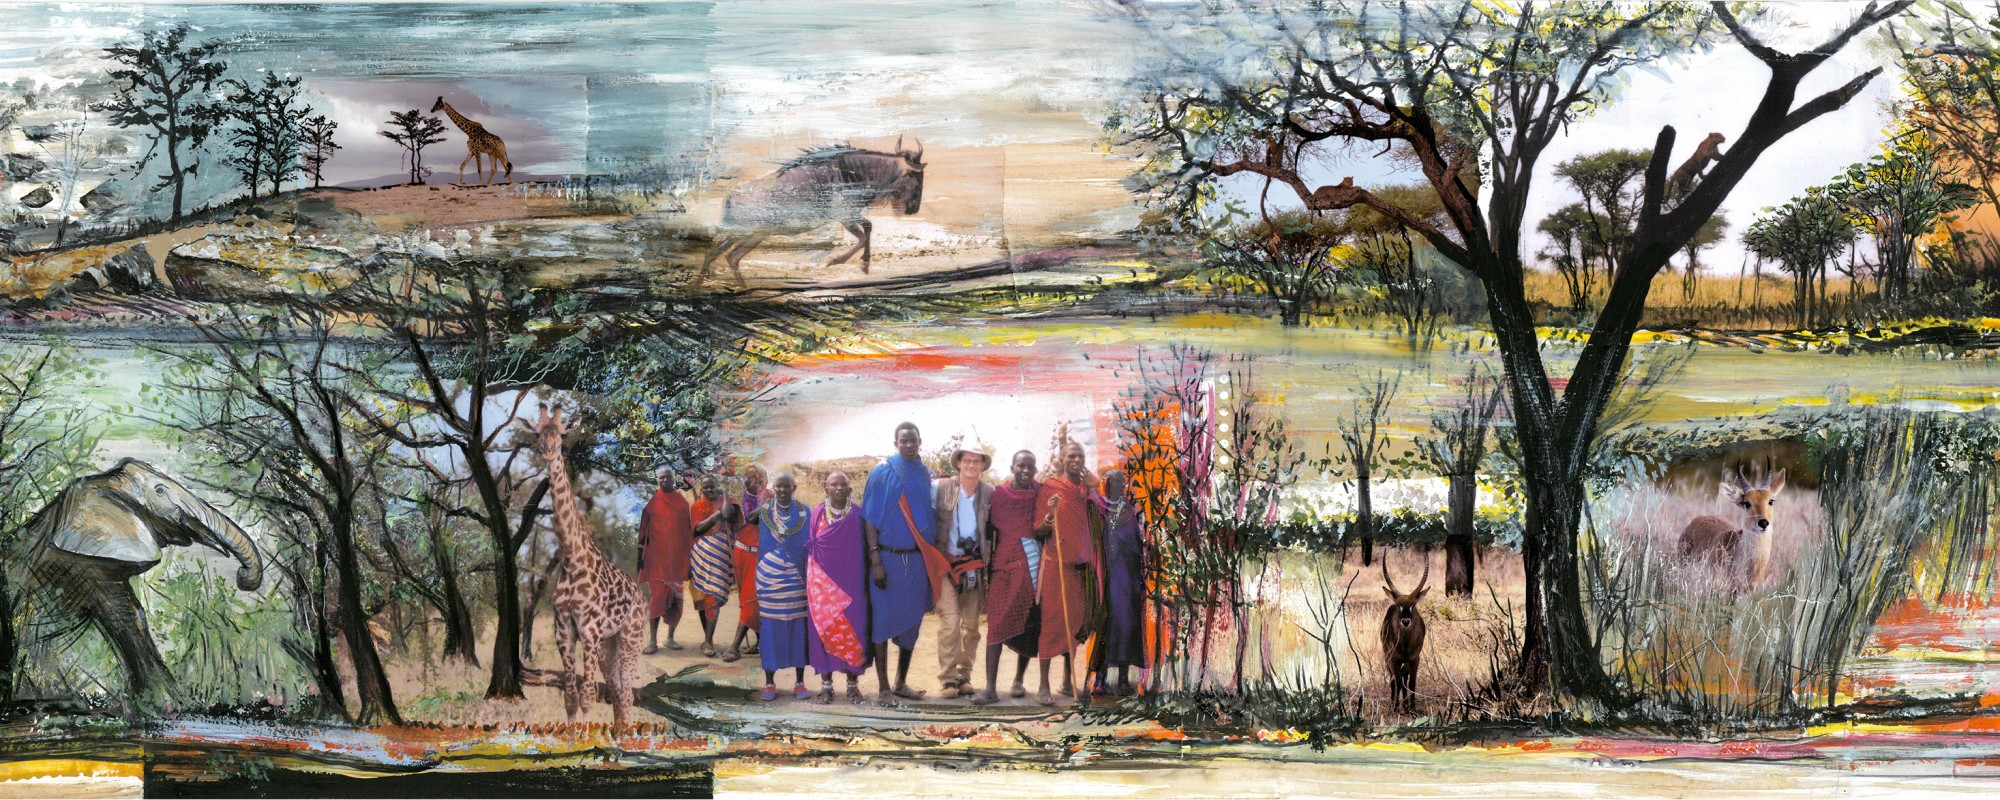 Grand Tanzanie avec elephant site